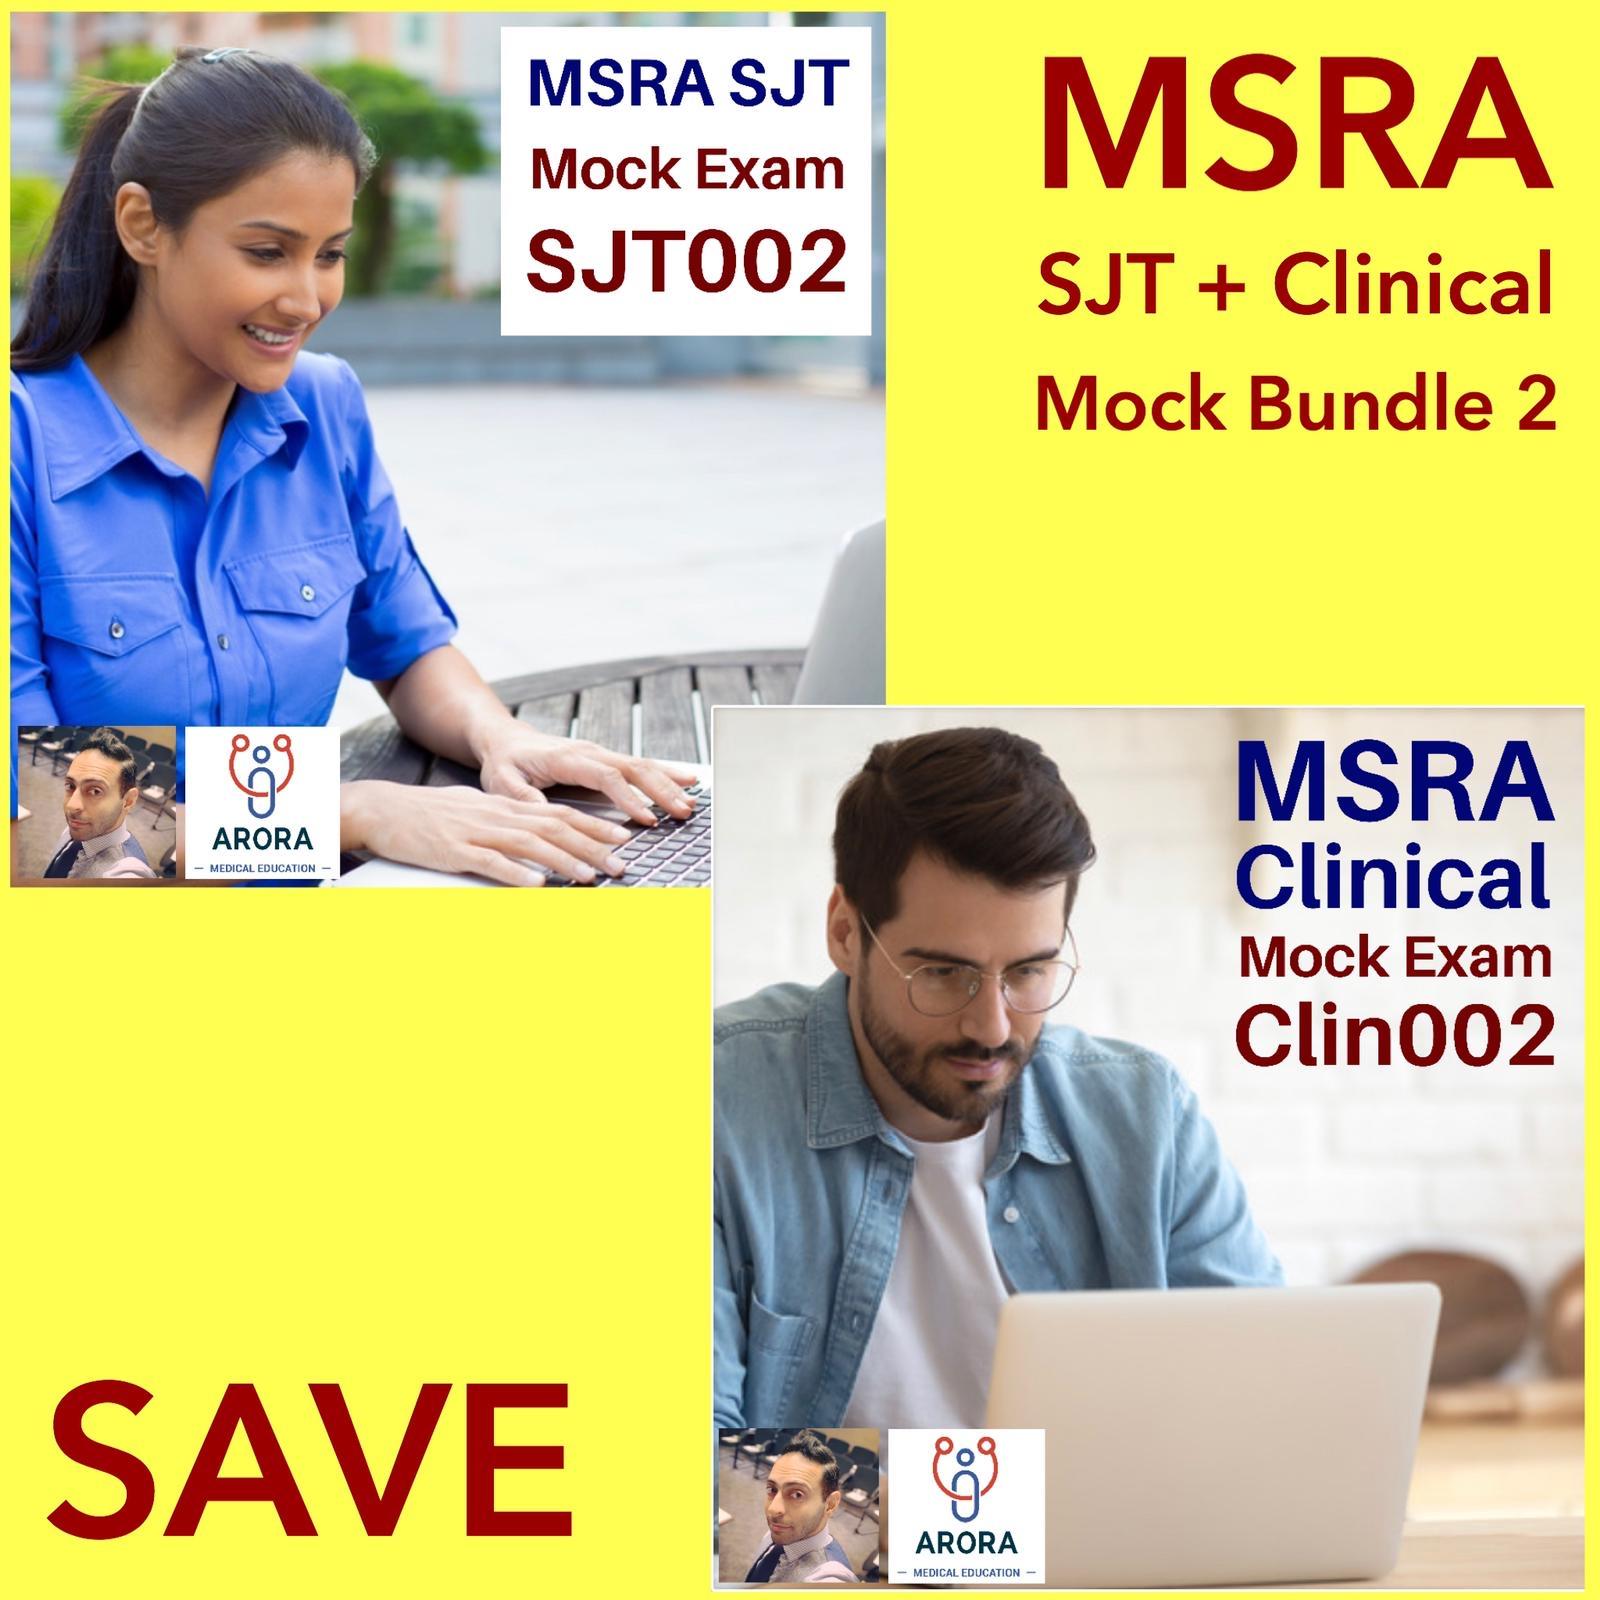 b252dda8 601c 4c64 9ce9 144db885fbdd - MRCGP CSA, AKT and PLAB Exam Courses and Online Webinars - Arora Medical Education